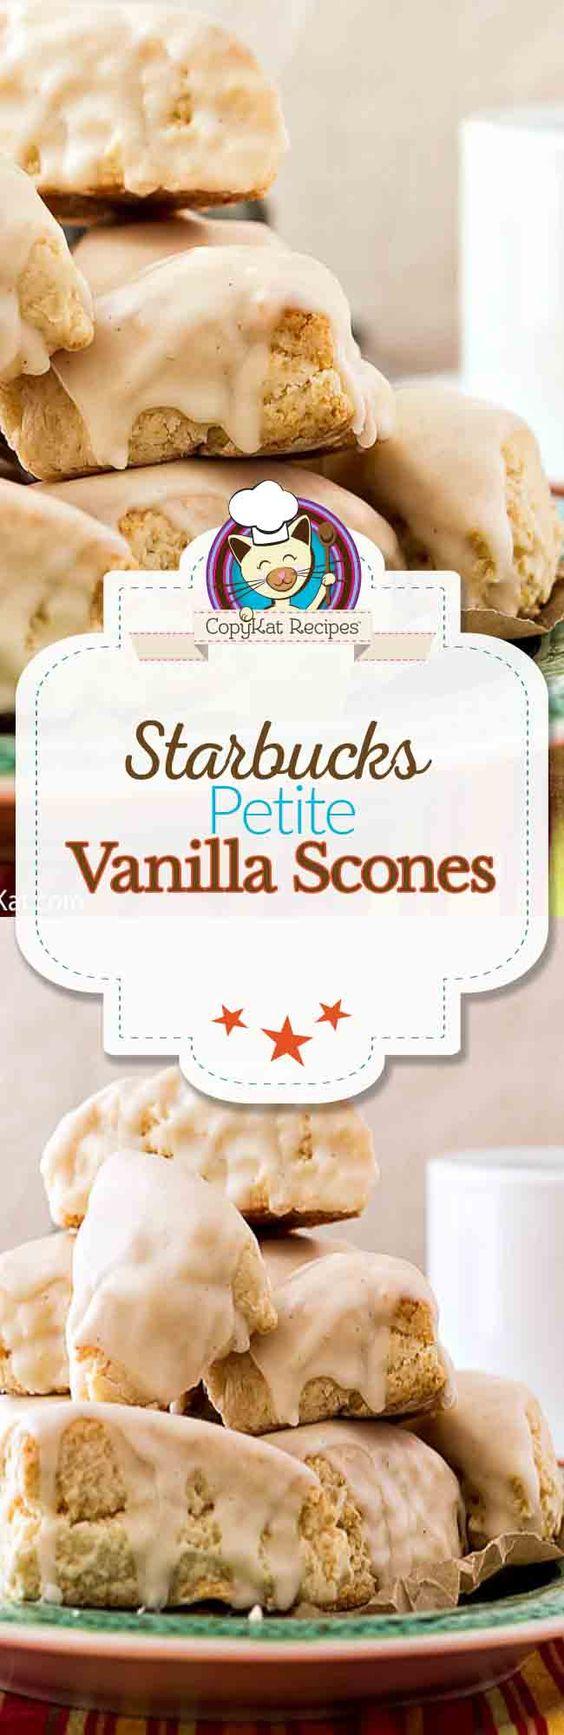 Starbuck's Petite Vanilla Scones – Copycat Recipe